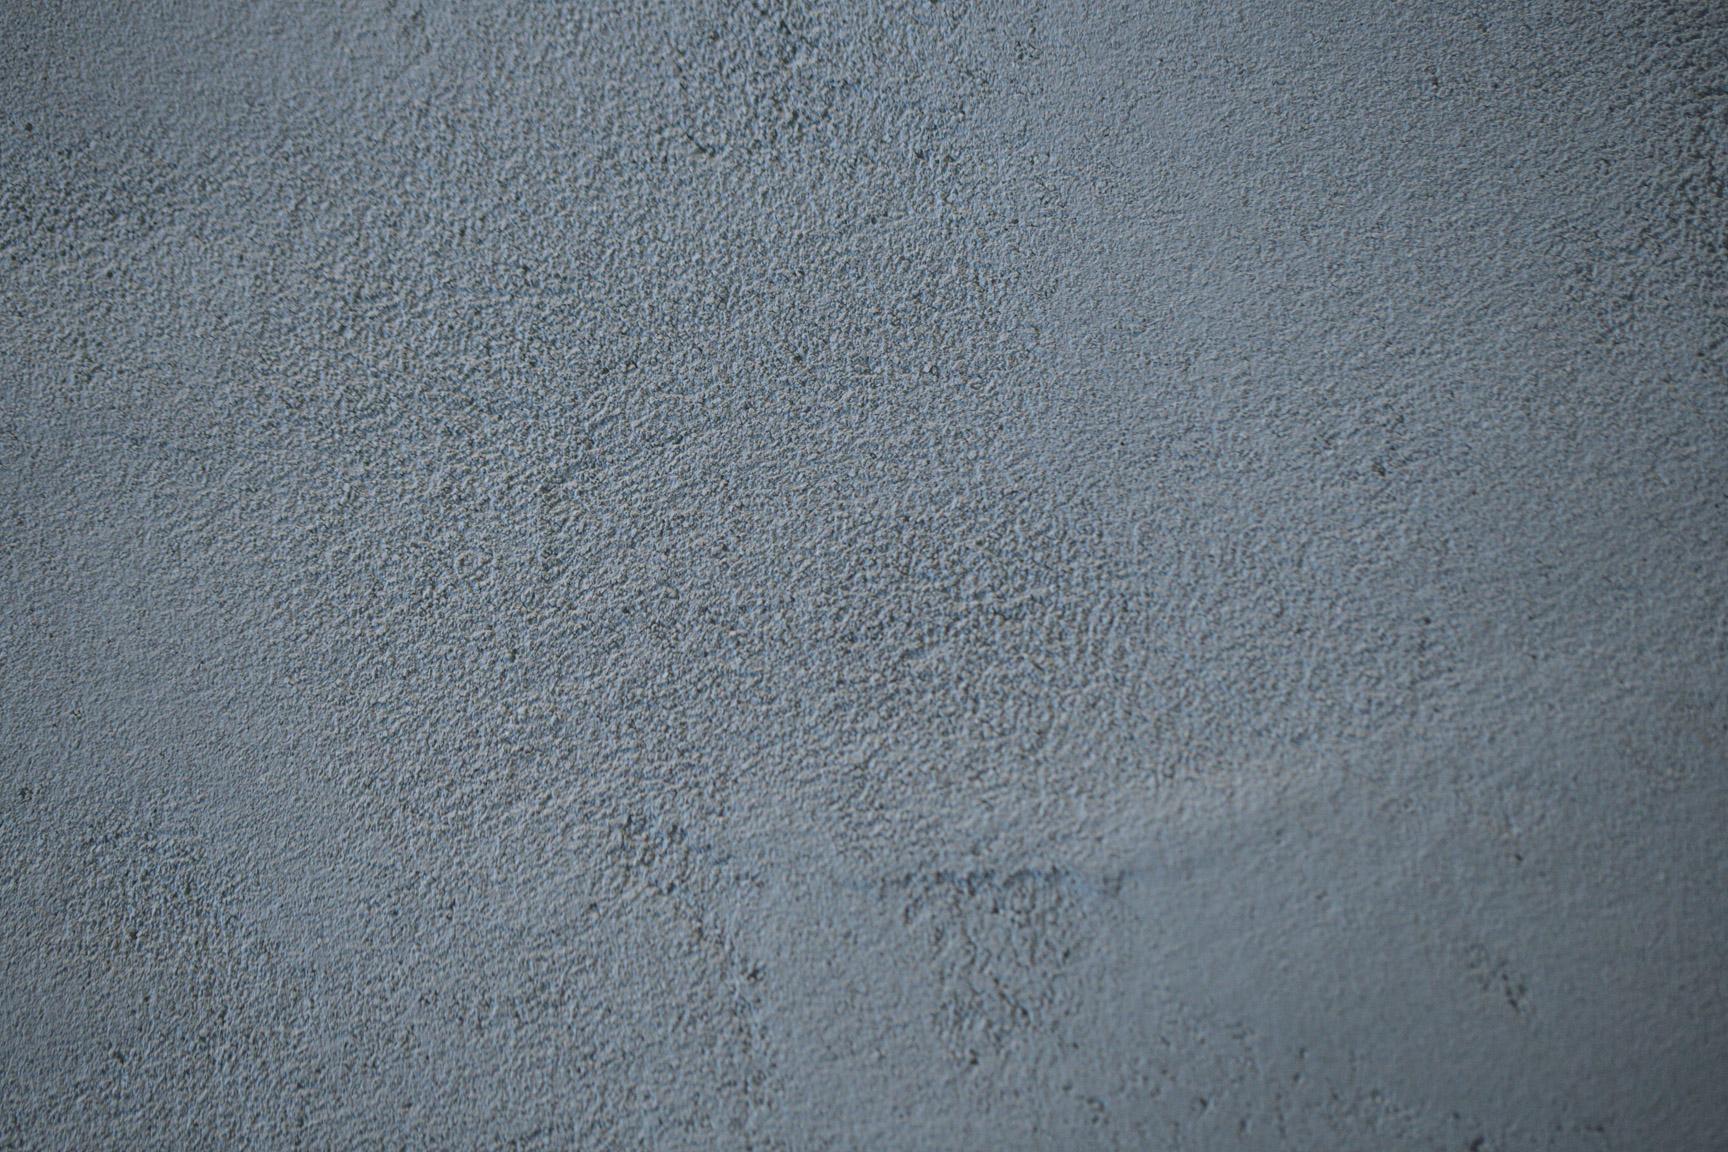 surfacedesign-15.jpg